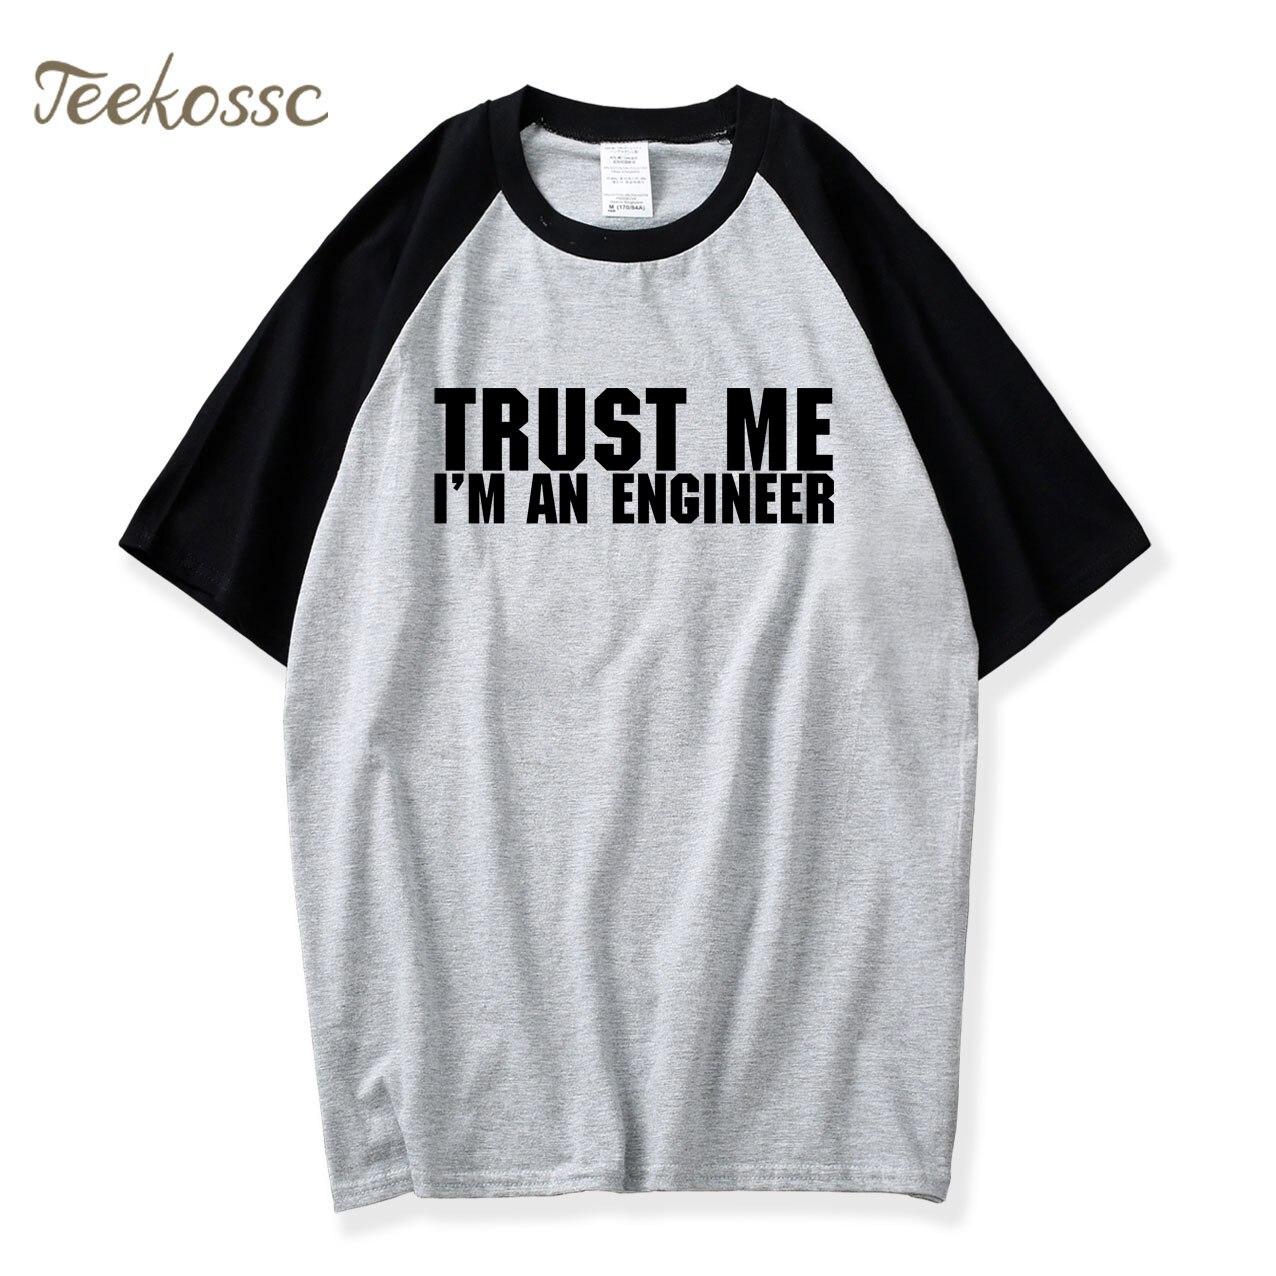 Trust Me I'm An Engineer Letters Print T Shirt 2018 New Summer Simple Raglan Tshirt Men 100% Cotton Men's Basic Camiseta T-Shirt